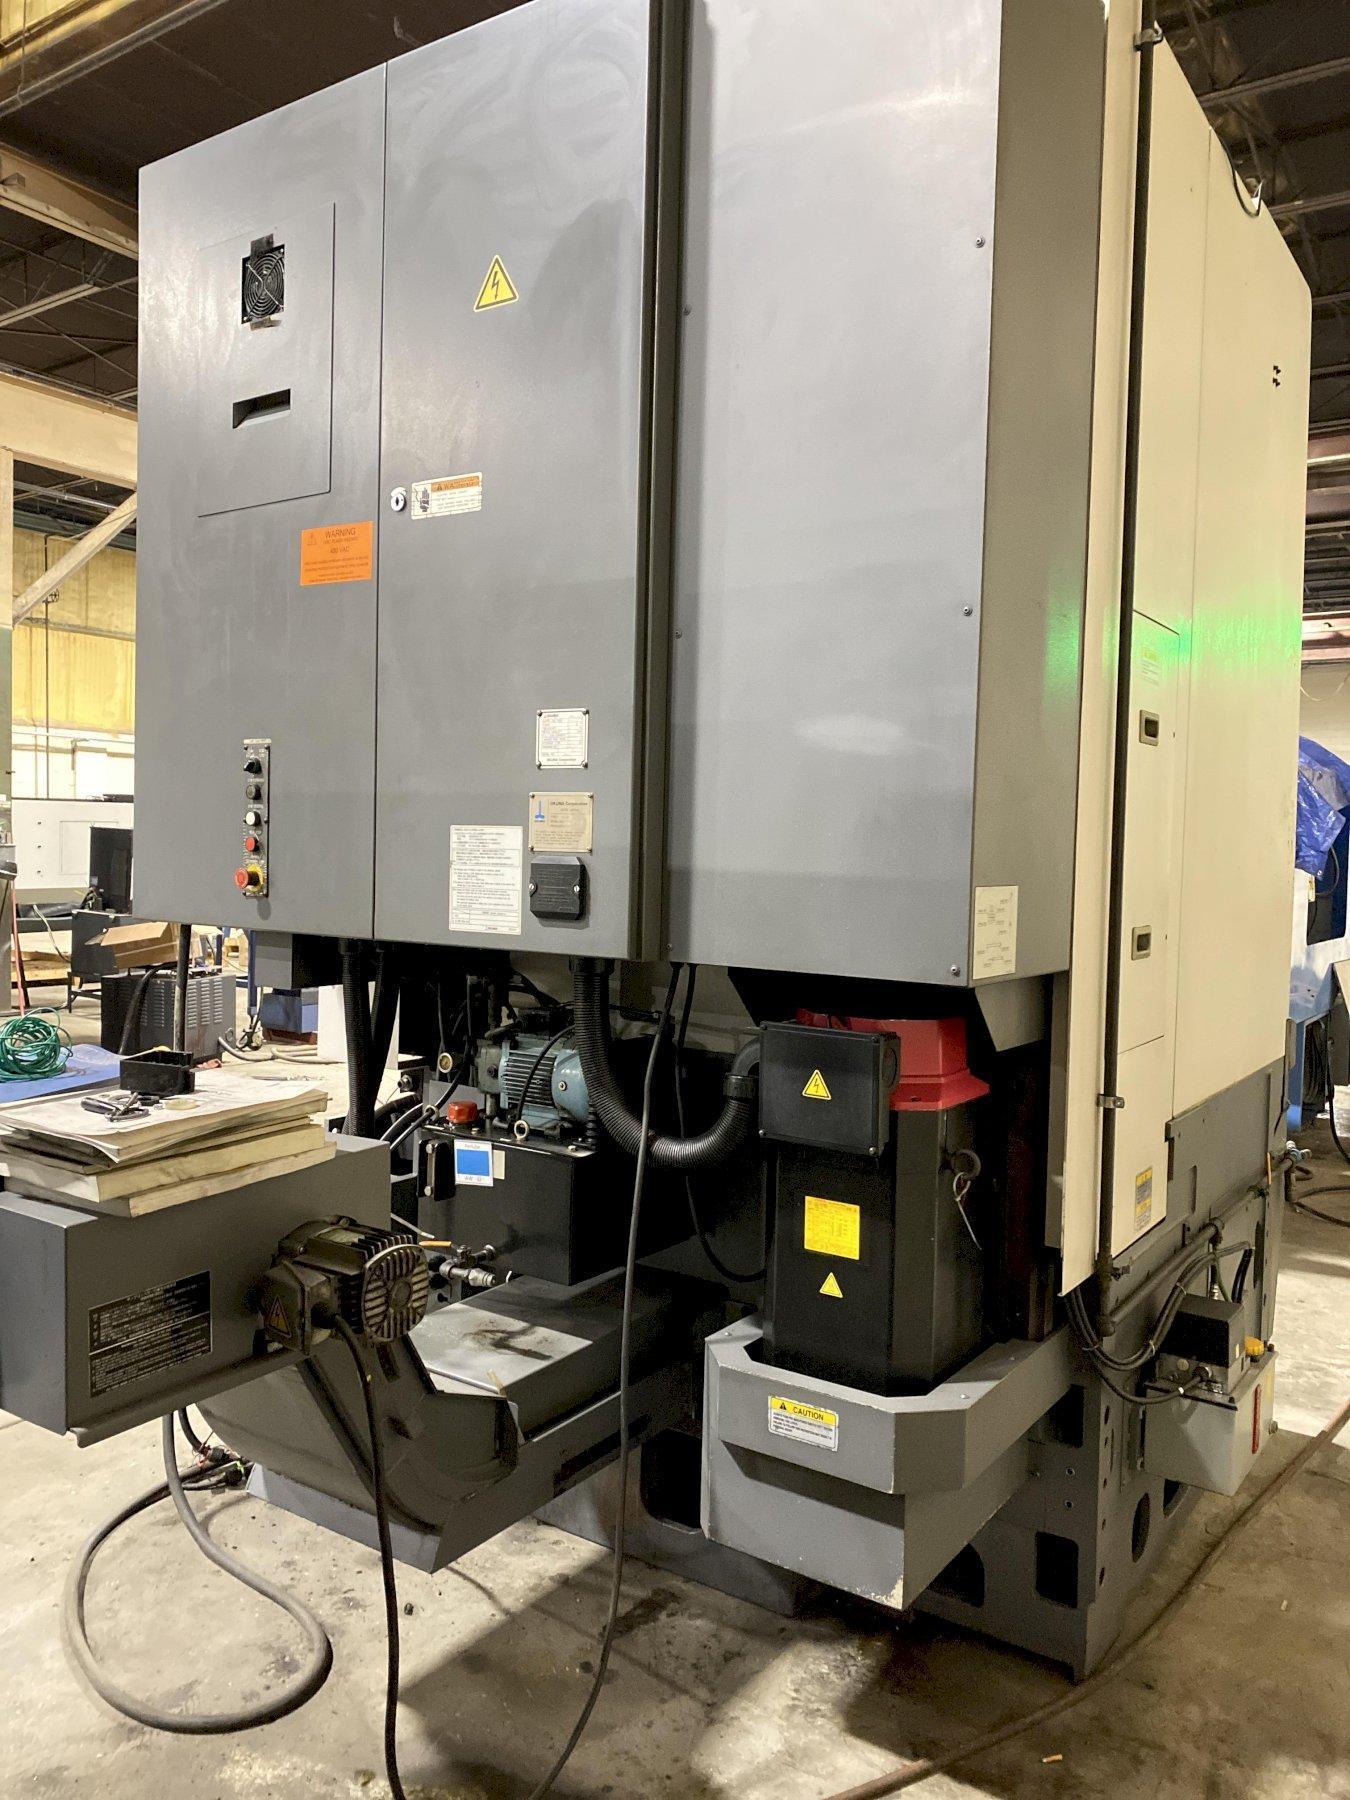 Okuma V60R CNC Vertical Turret Lathe 2010